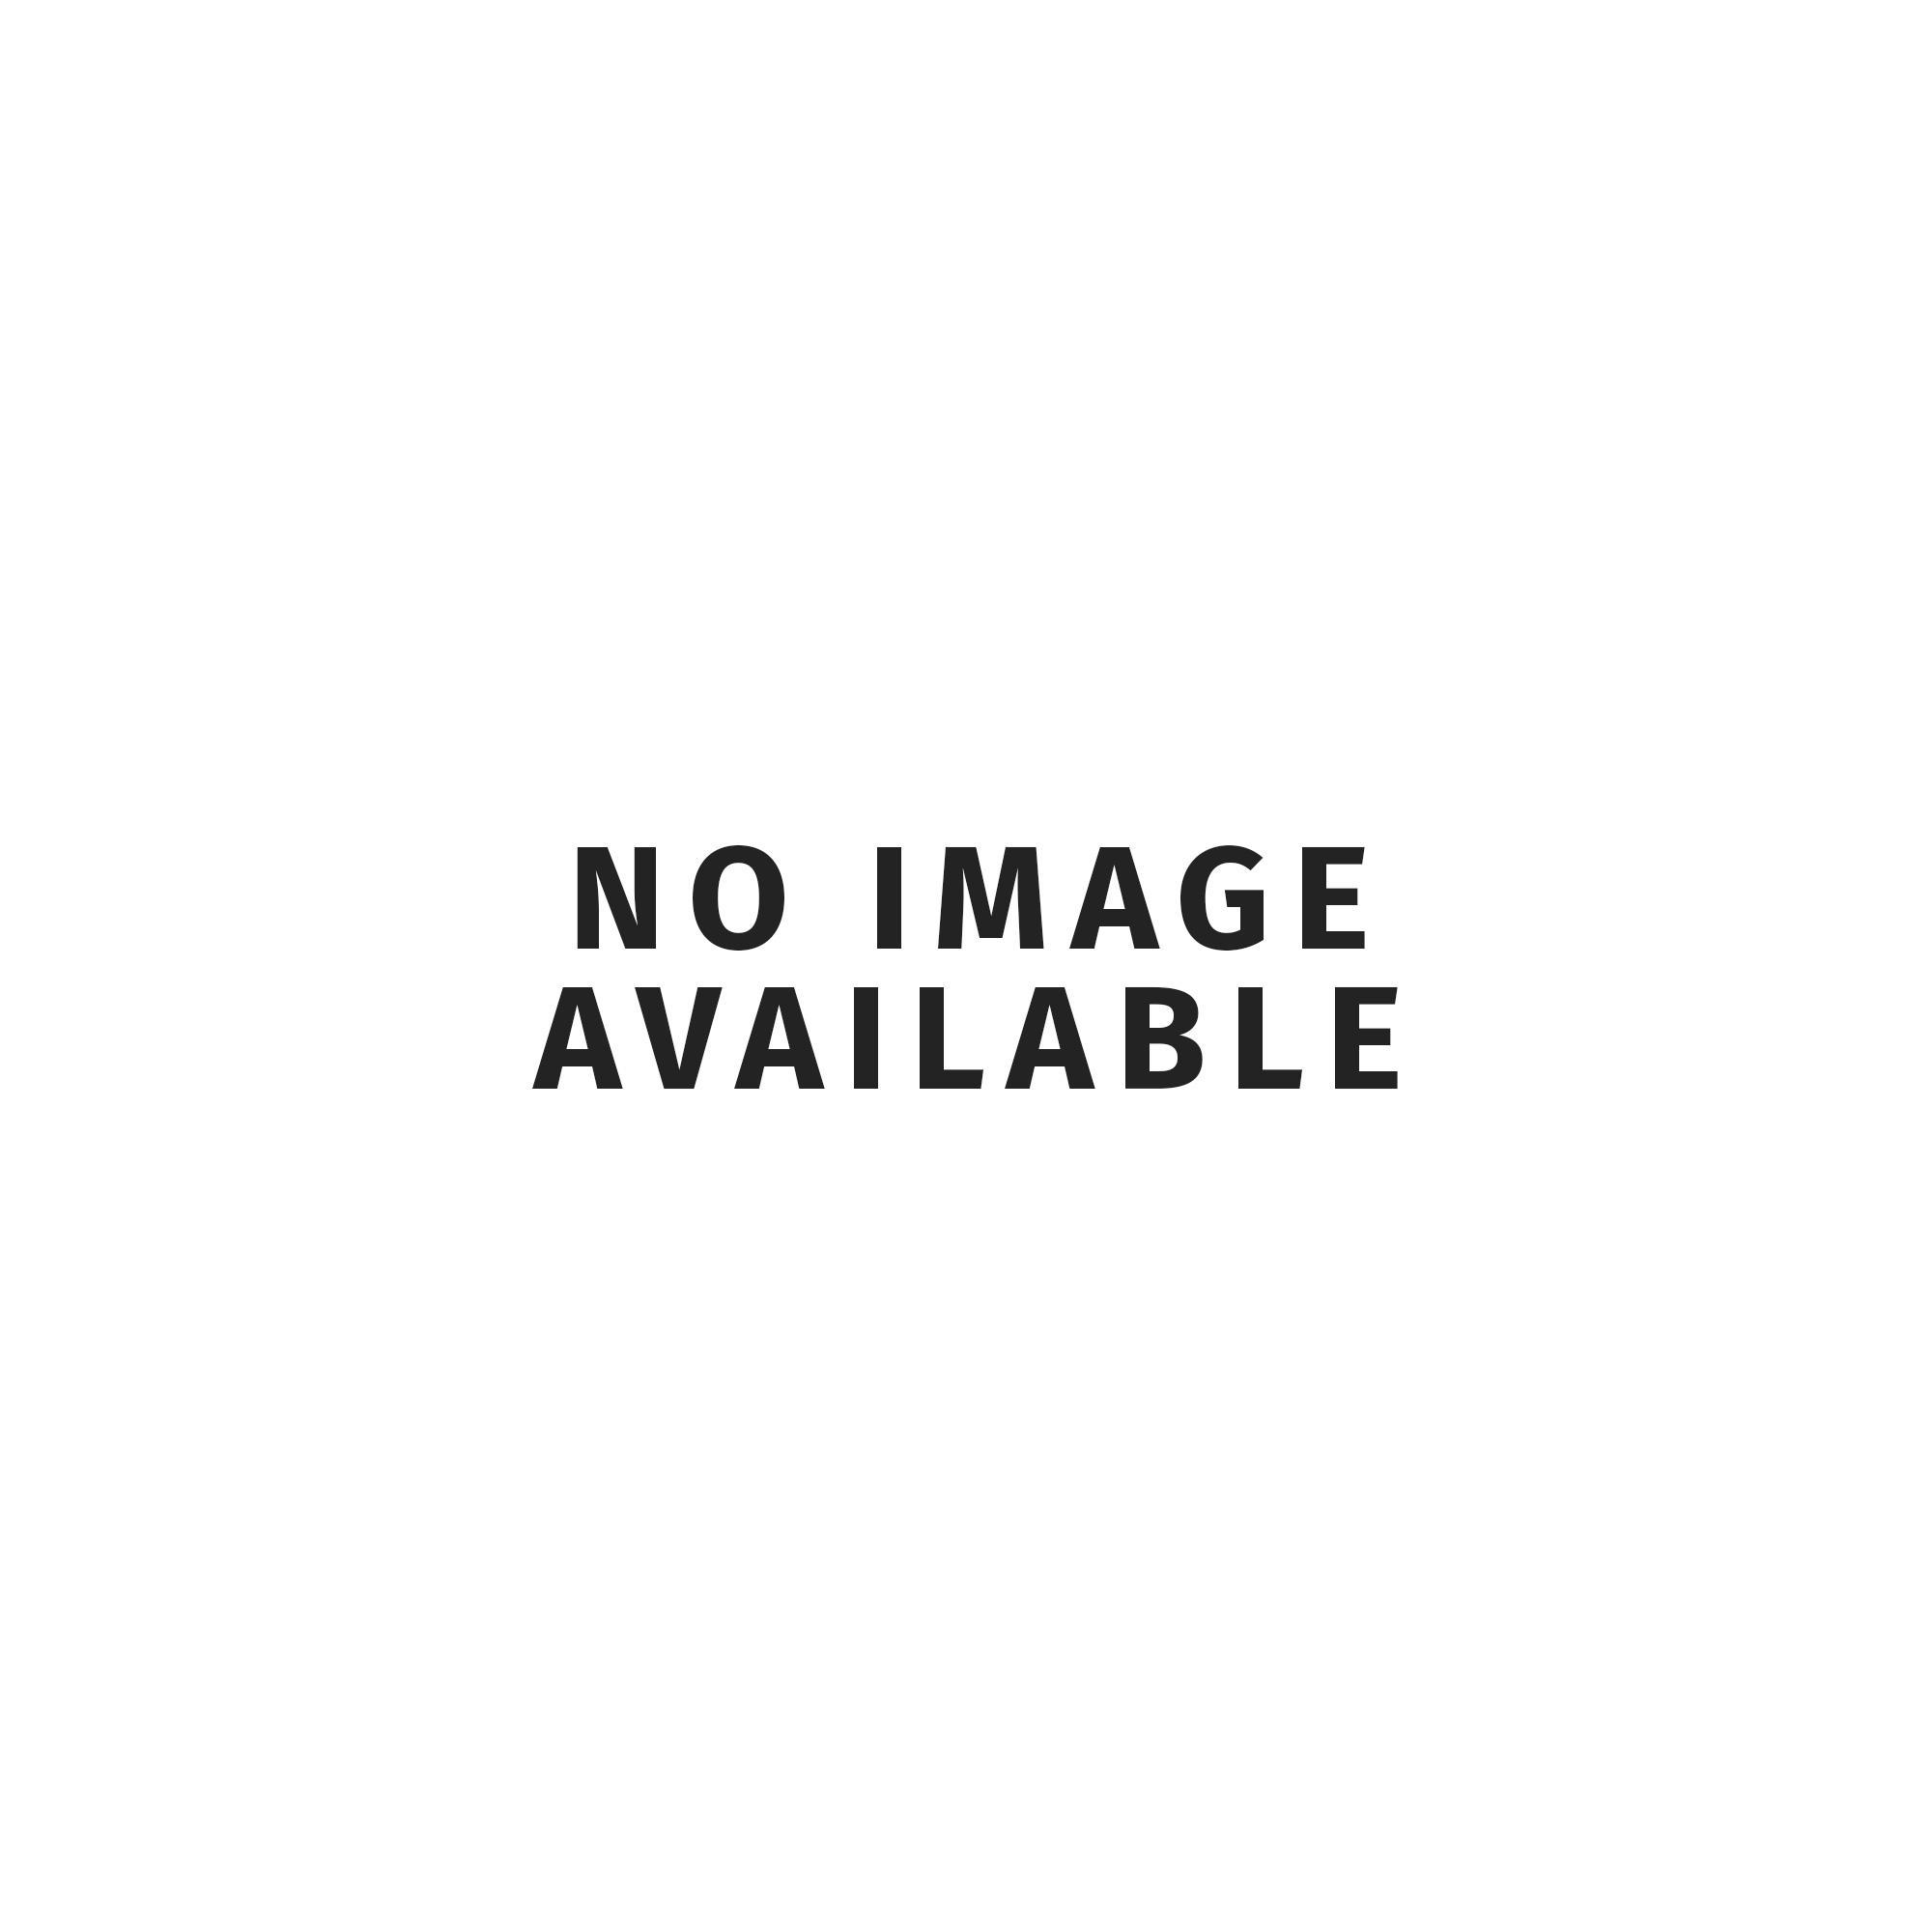 Bontrager Nebula 44T 170 Black Crankset